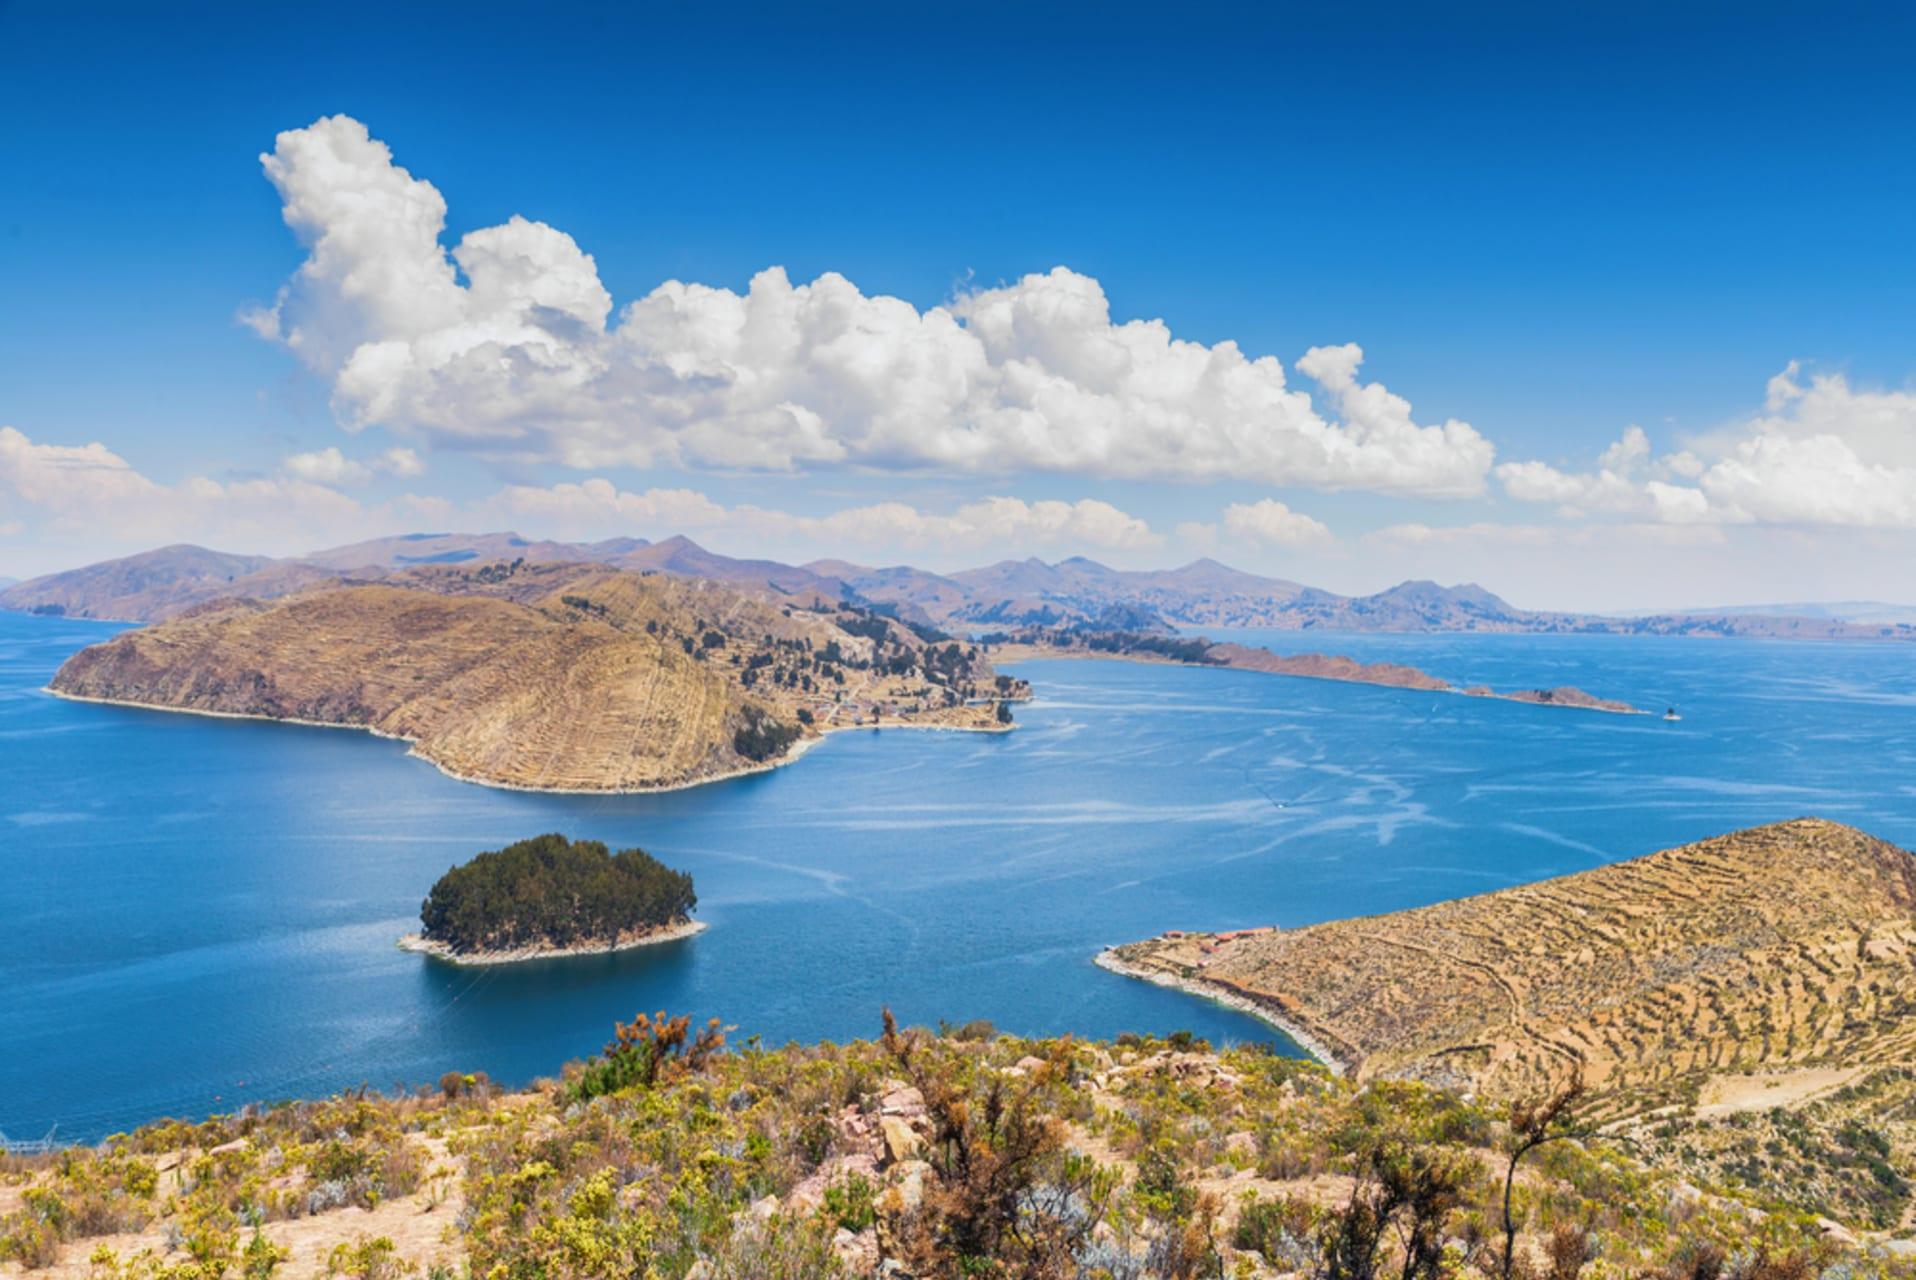 Lake Titicaca - Bolivia - Lake Titicaca: The Highest Navigable Lake in the World